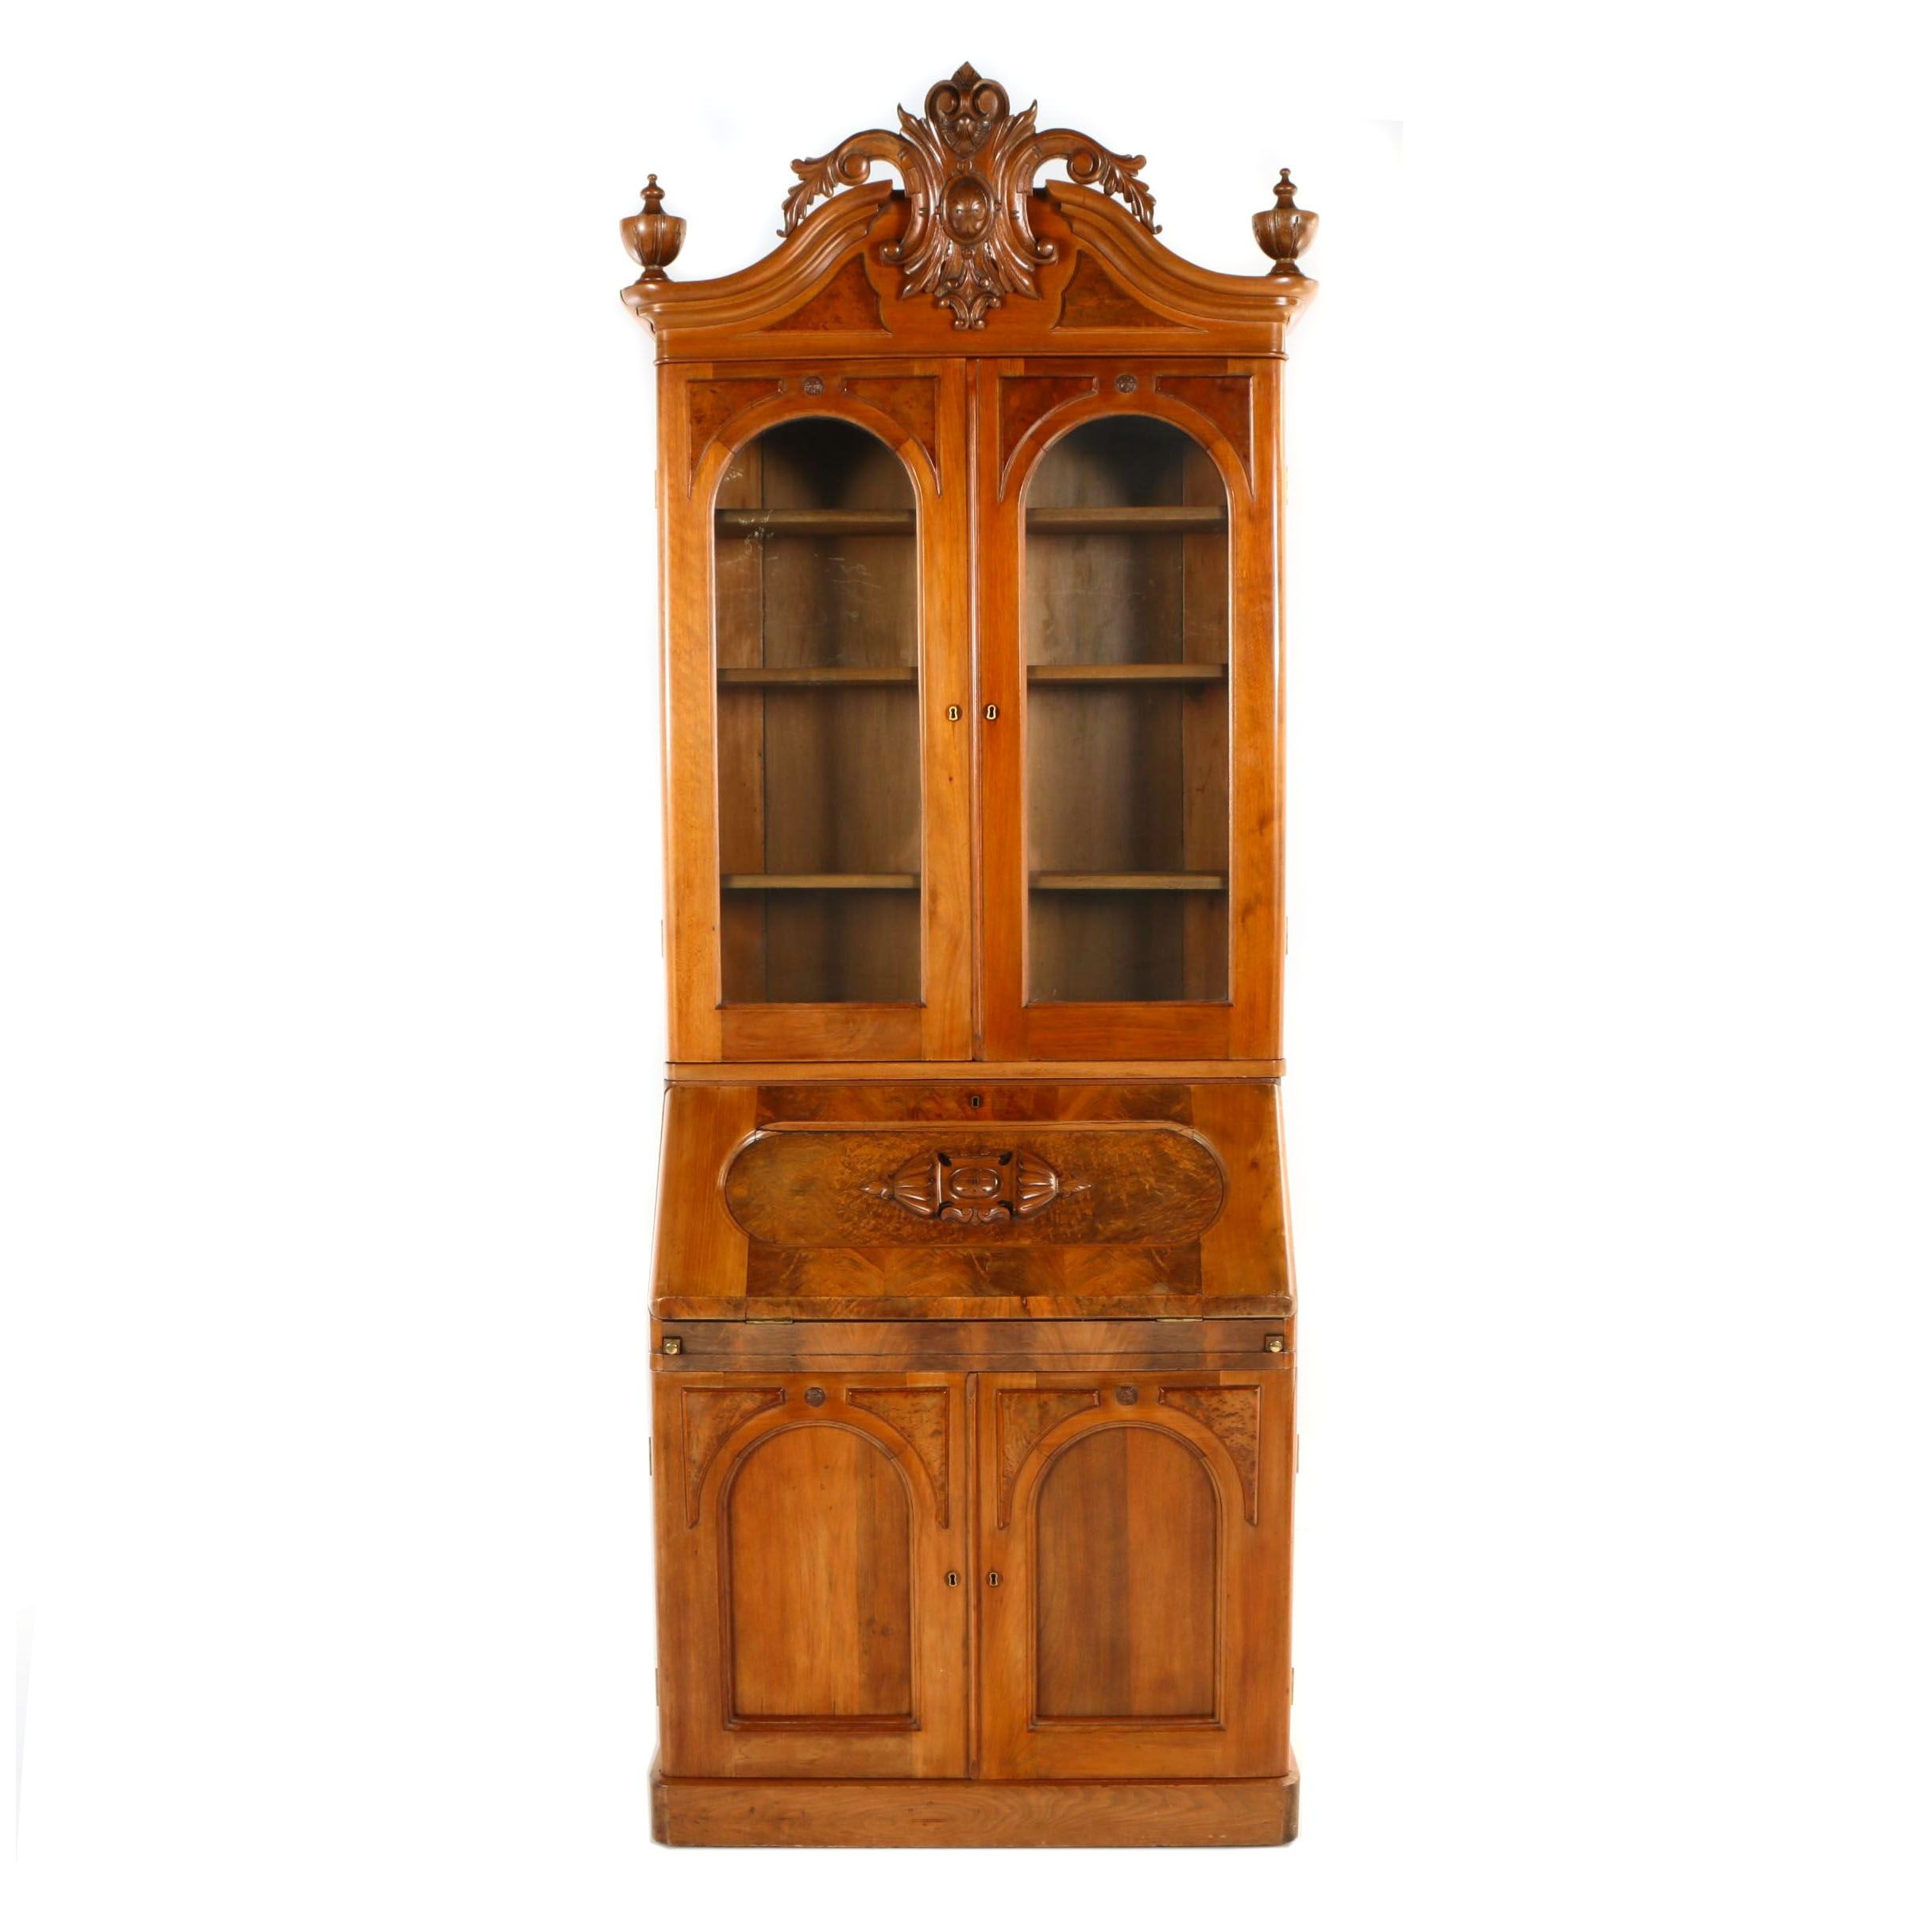 Rococo Revival Walnut and Burl Walnut Secretary Bookcase, Mid 19th Century